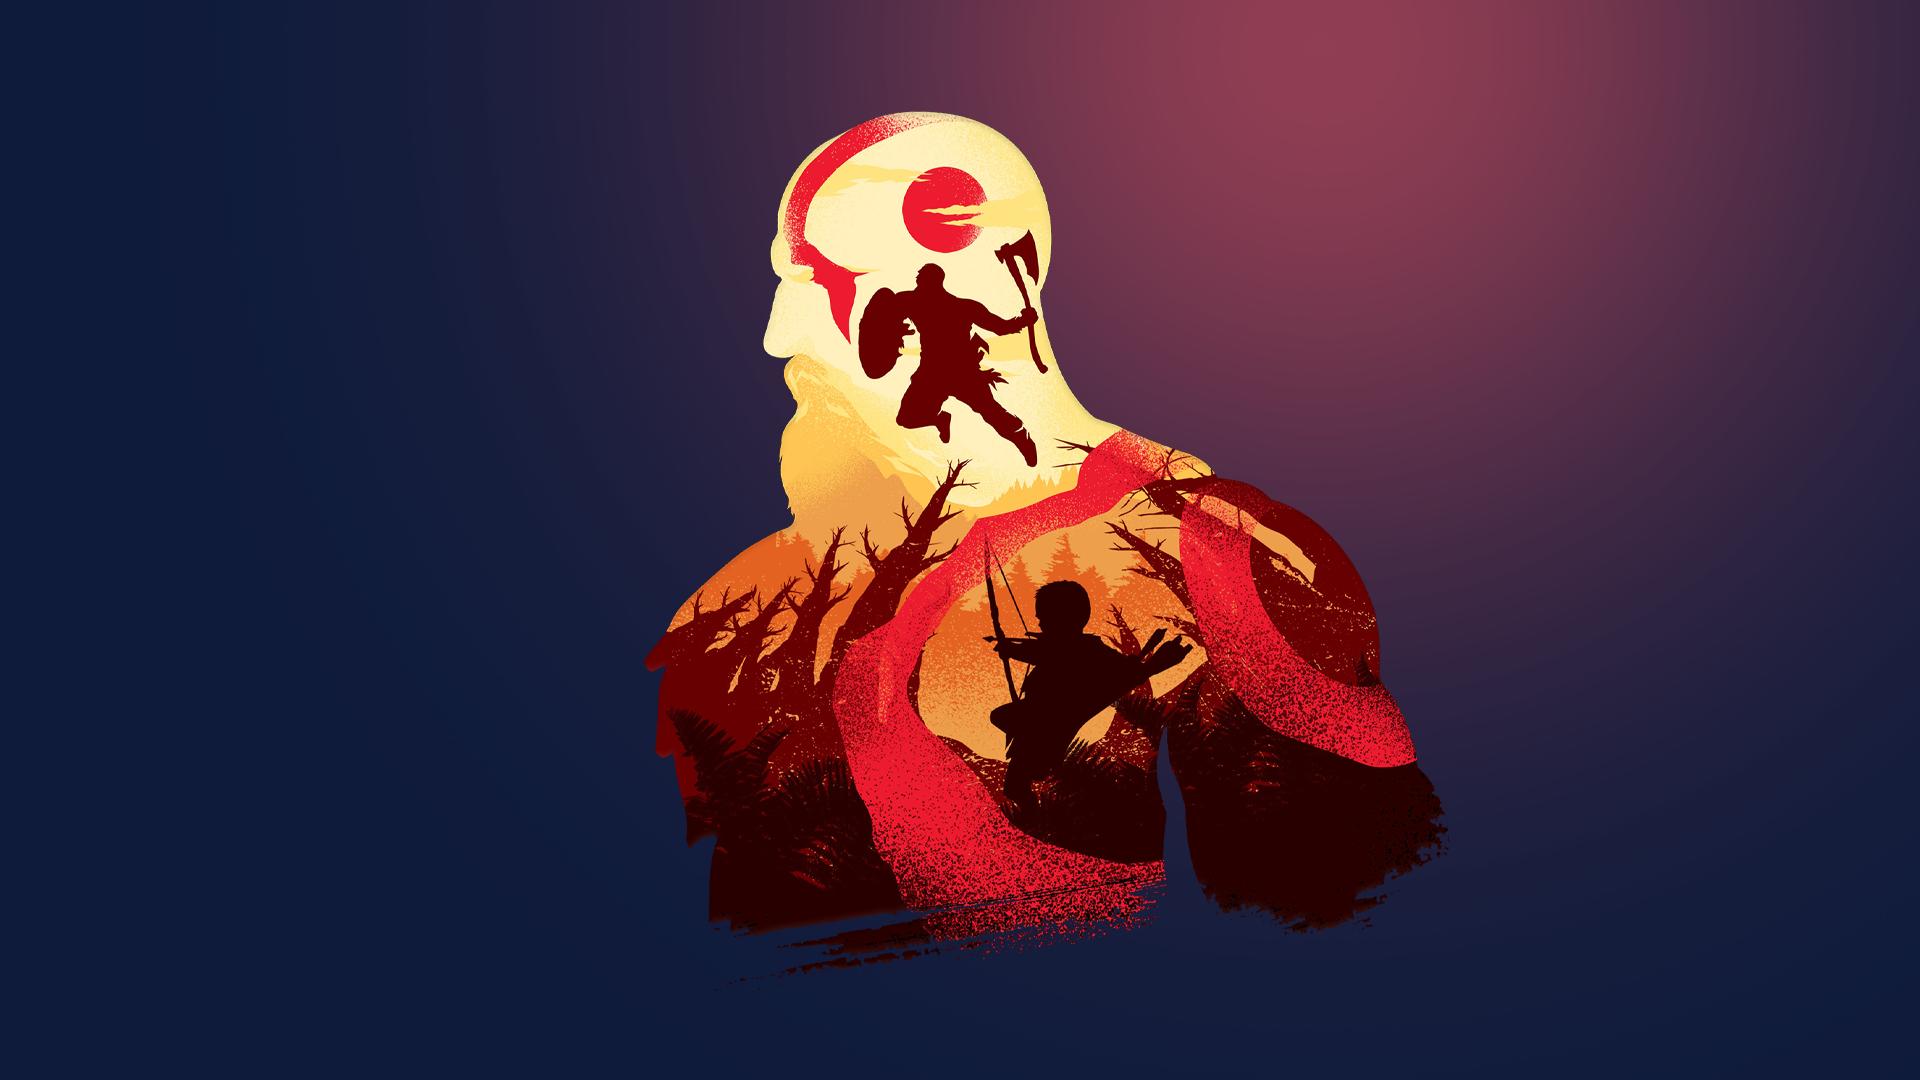 General 1920x1080 God of War minimalism video games Kratos simple simple background